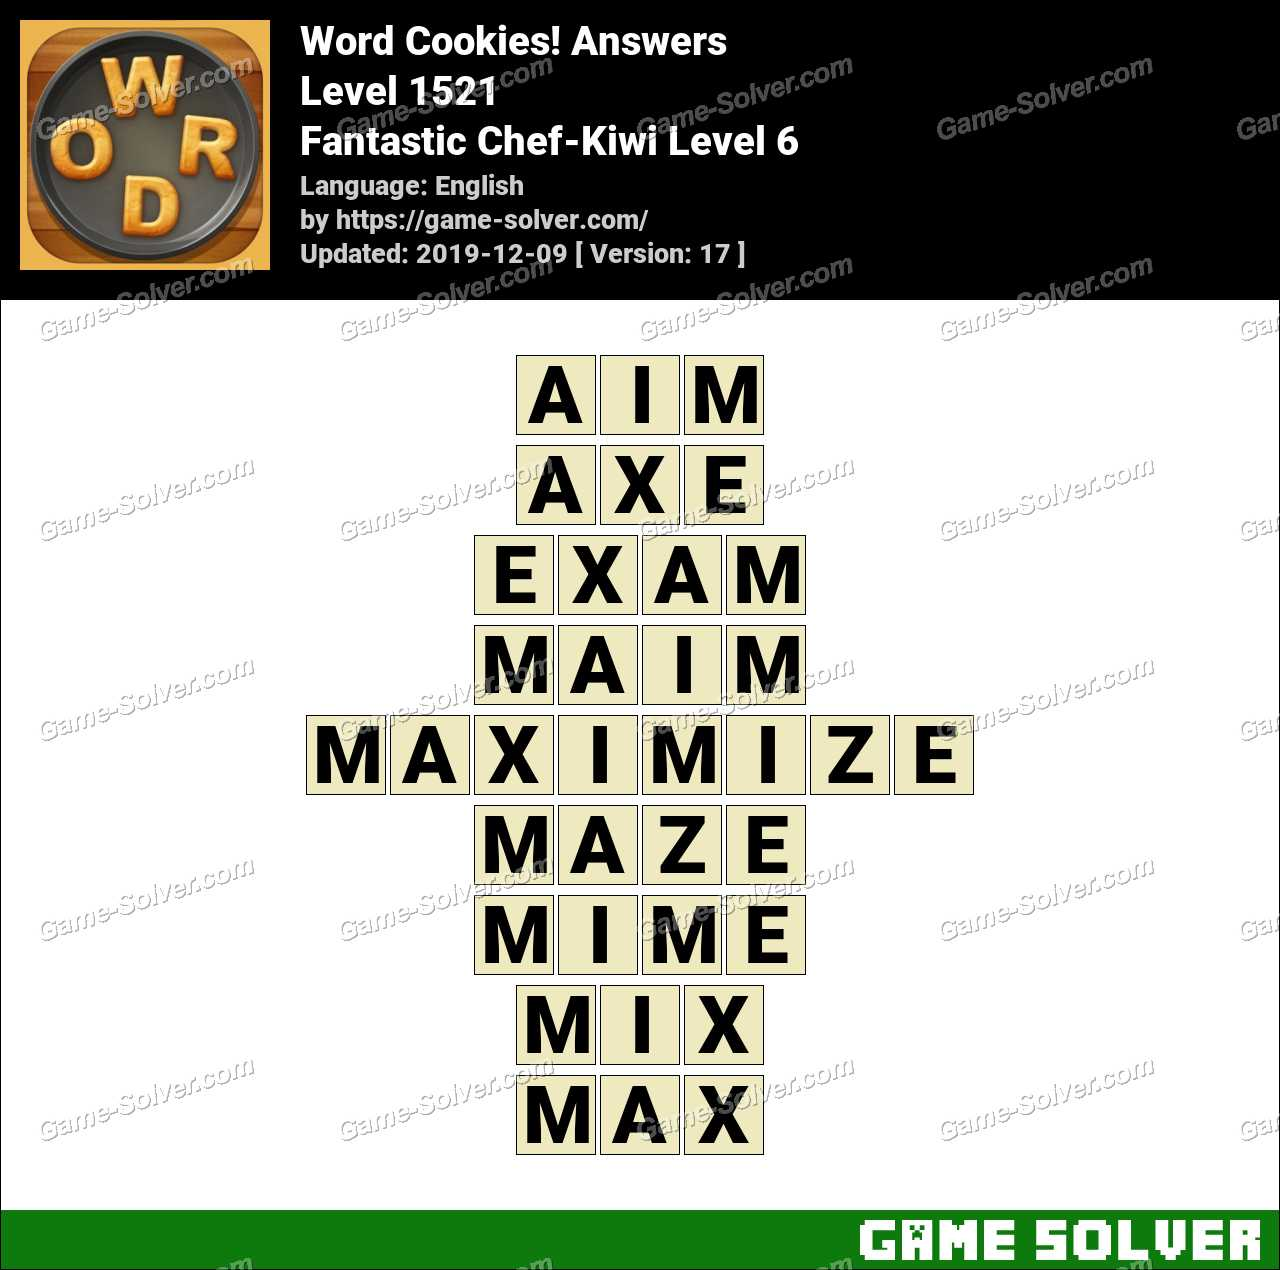 Word Cookies Fantastic Chef-Kiwi Level 6 Answers